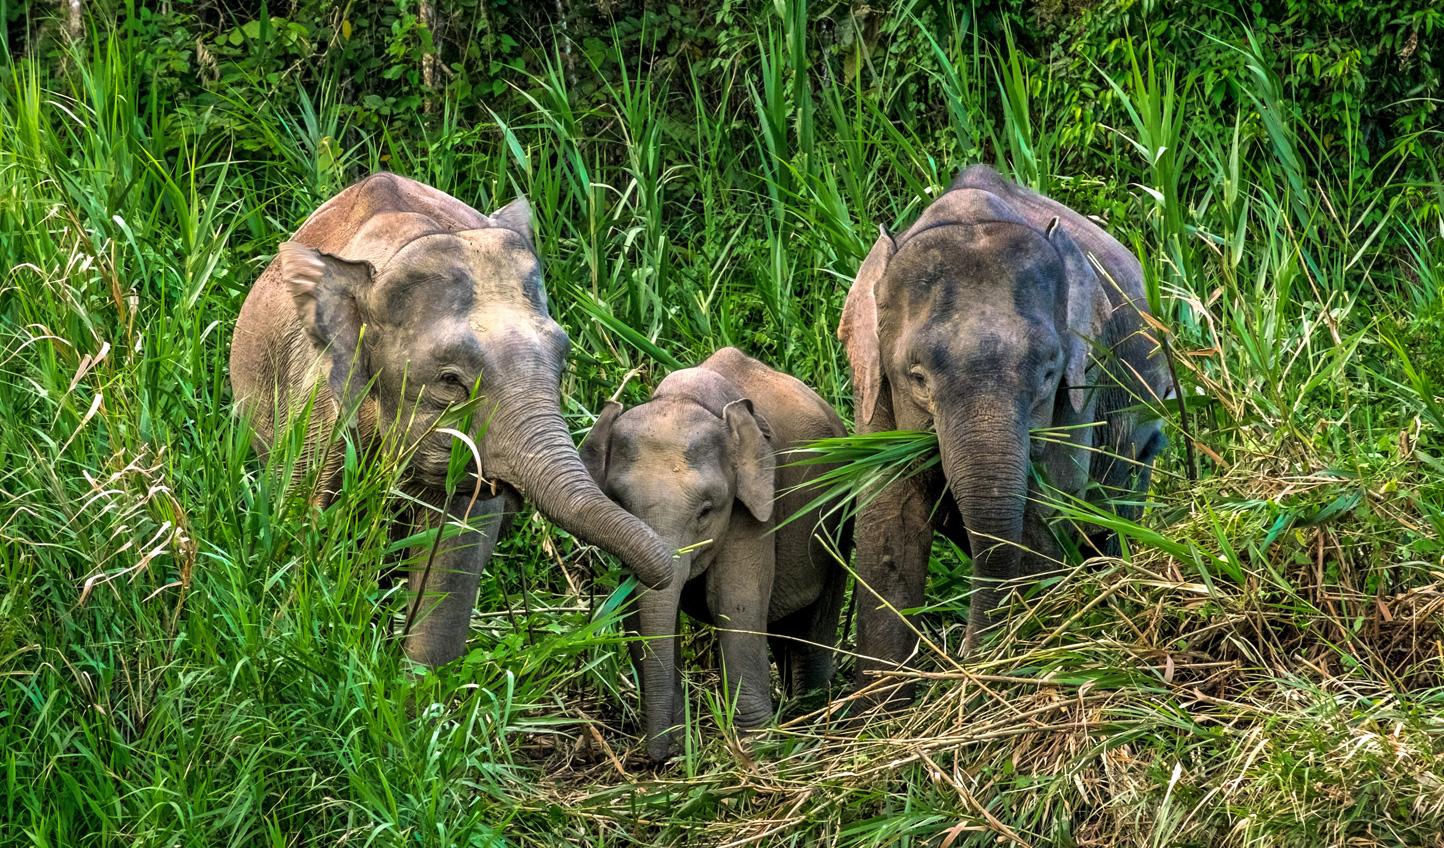 Elephants frequent the banks of the Kinabatangan River